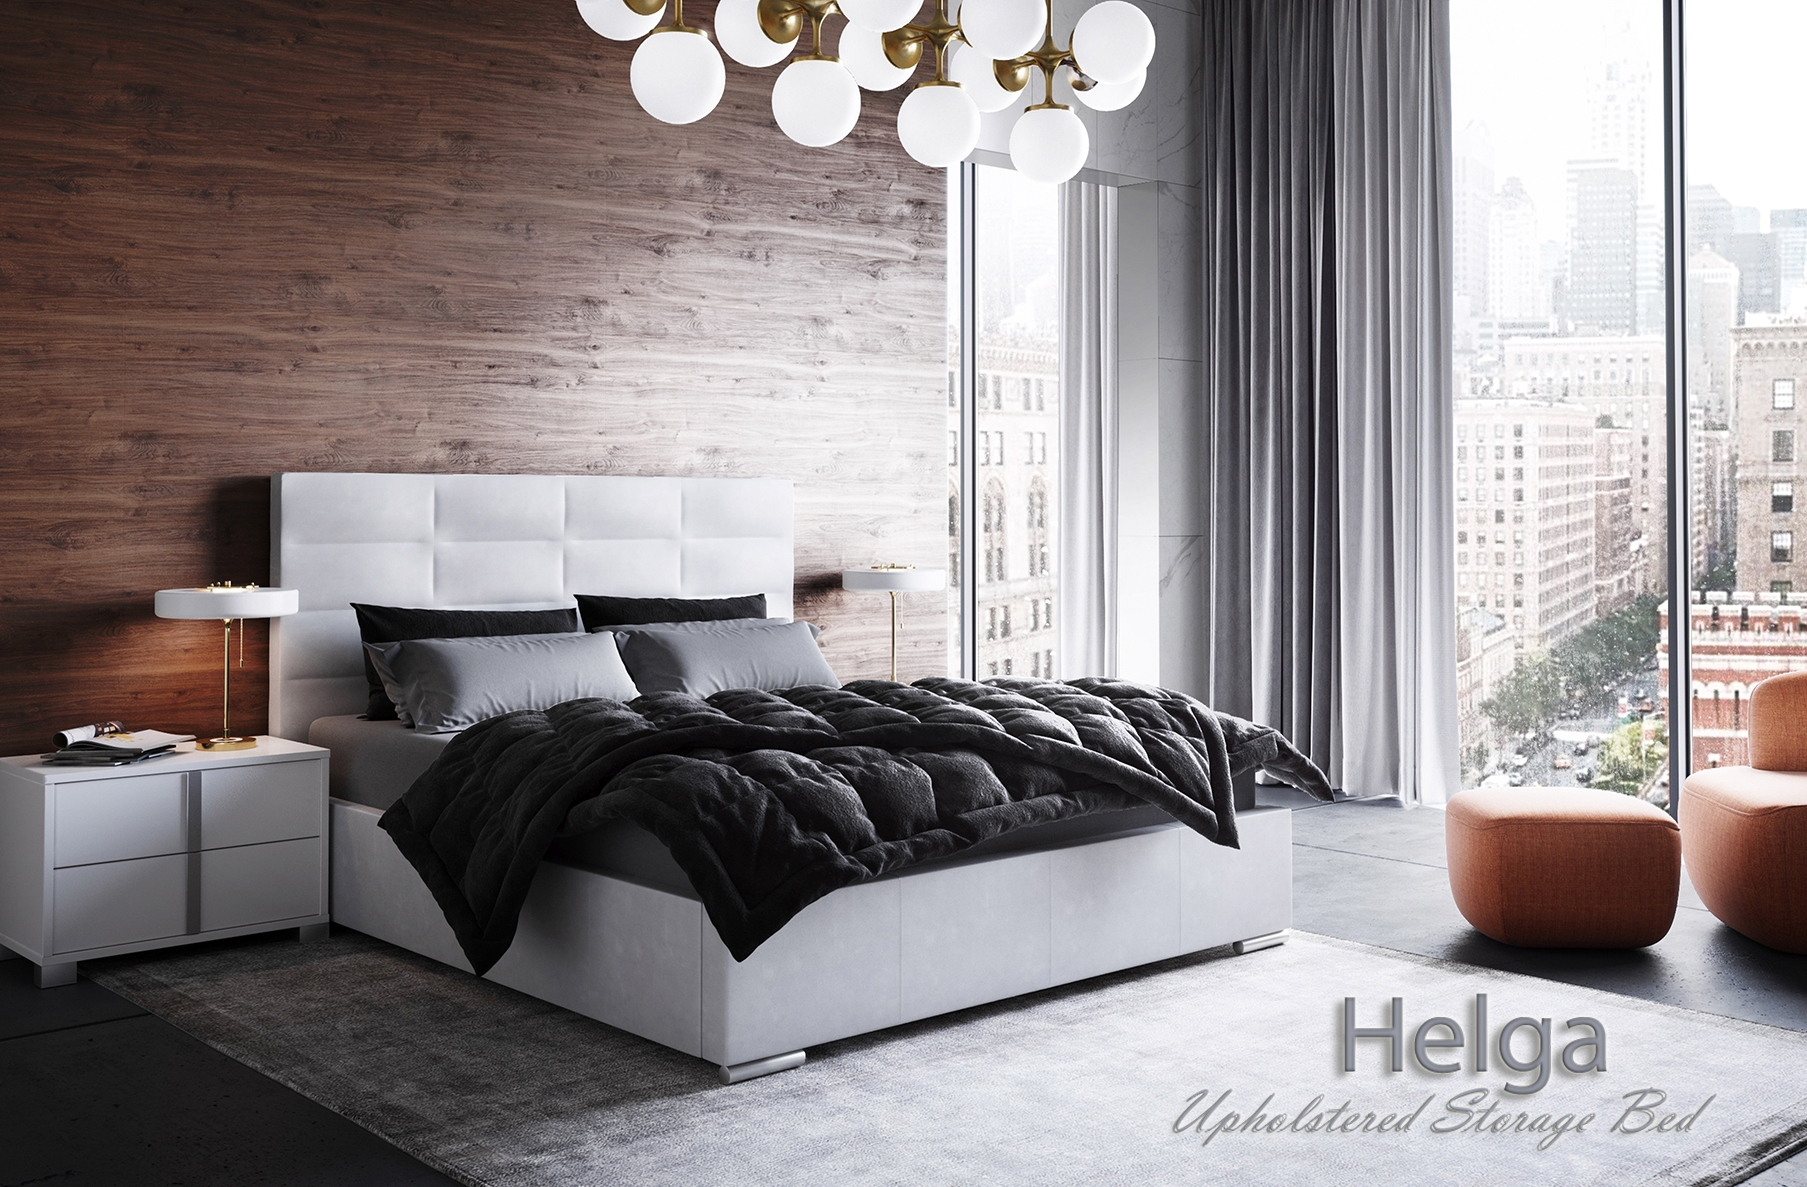 Helga Upholstered Bed, Cheap